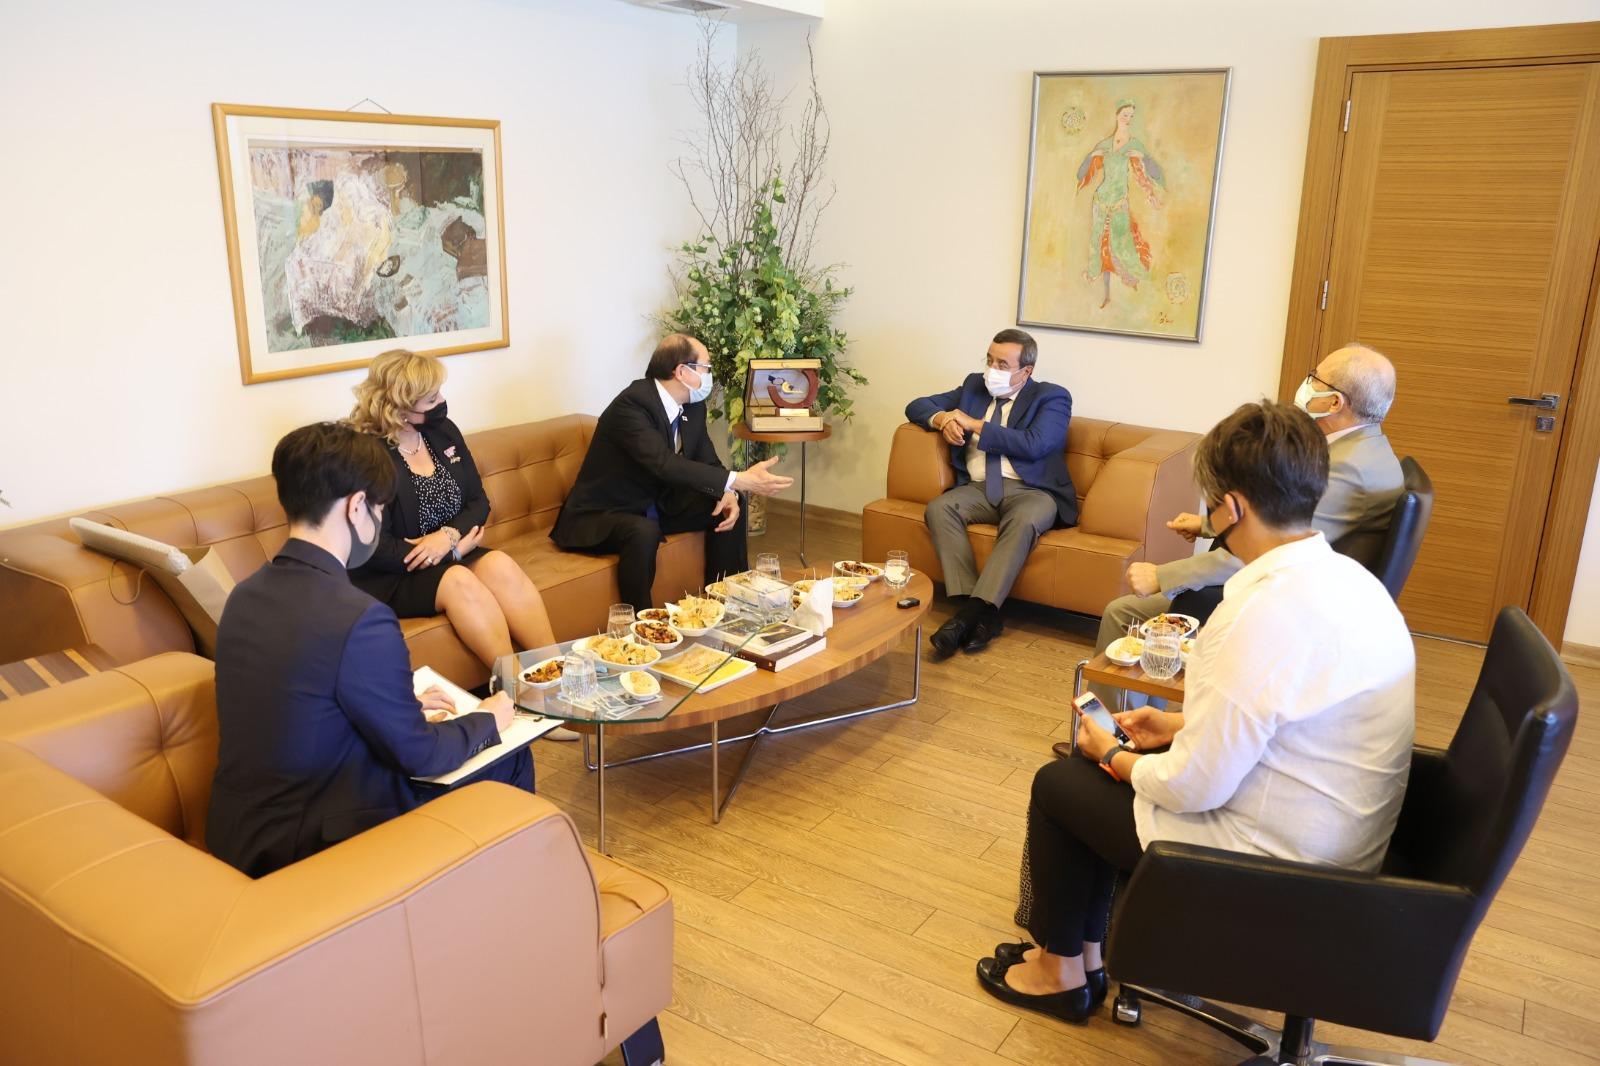 Başkan Batur, Japonya İstanbul Başkonsolosu Hisao Nishimaki'yi konuk etti (6)